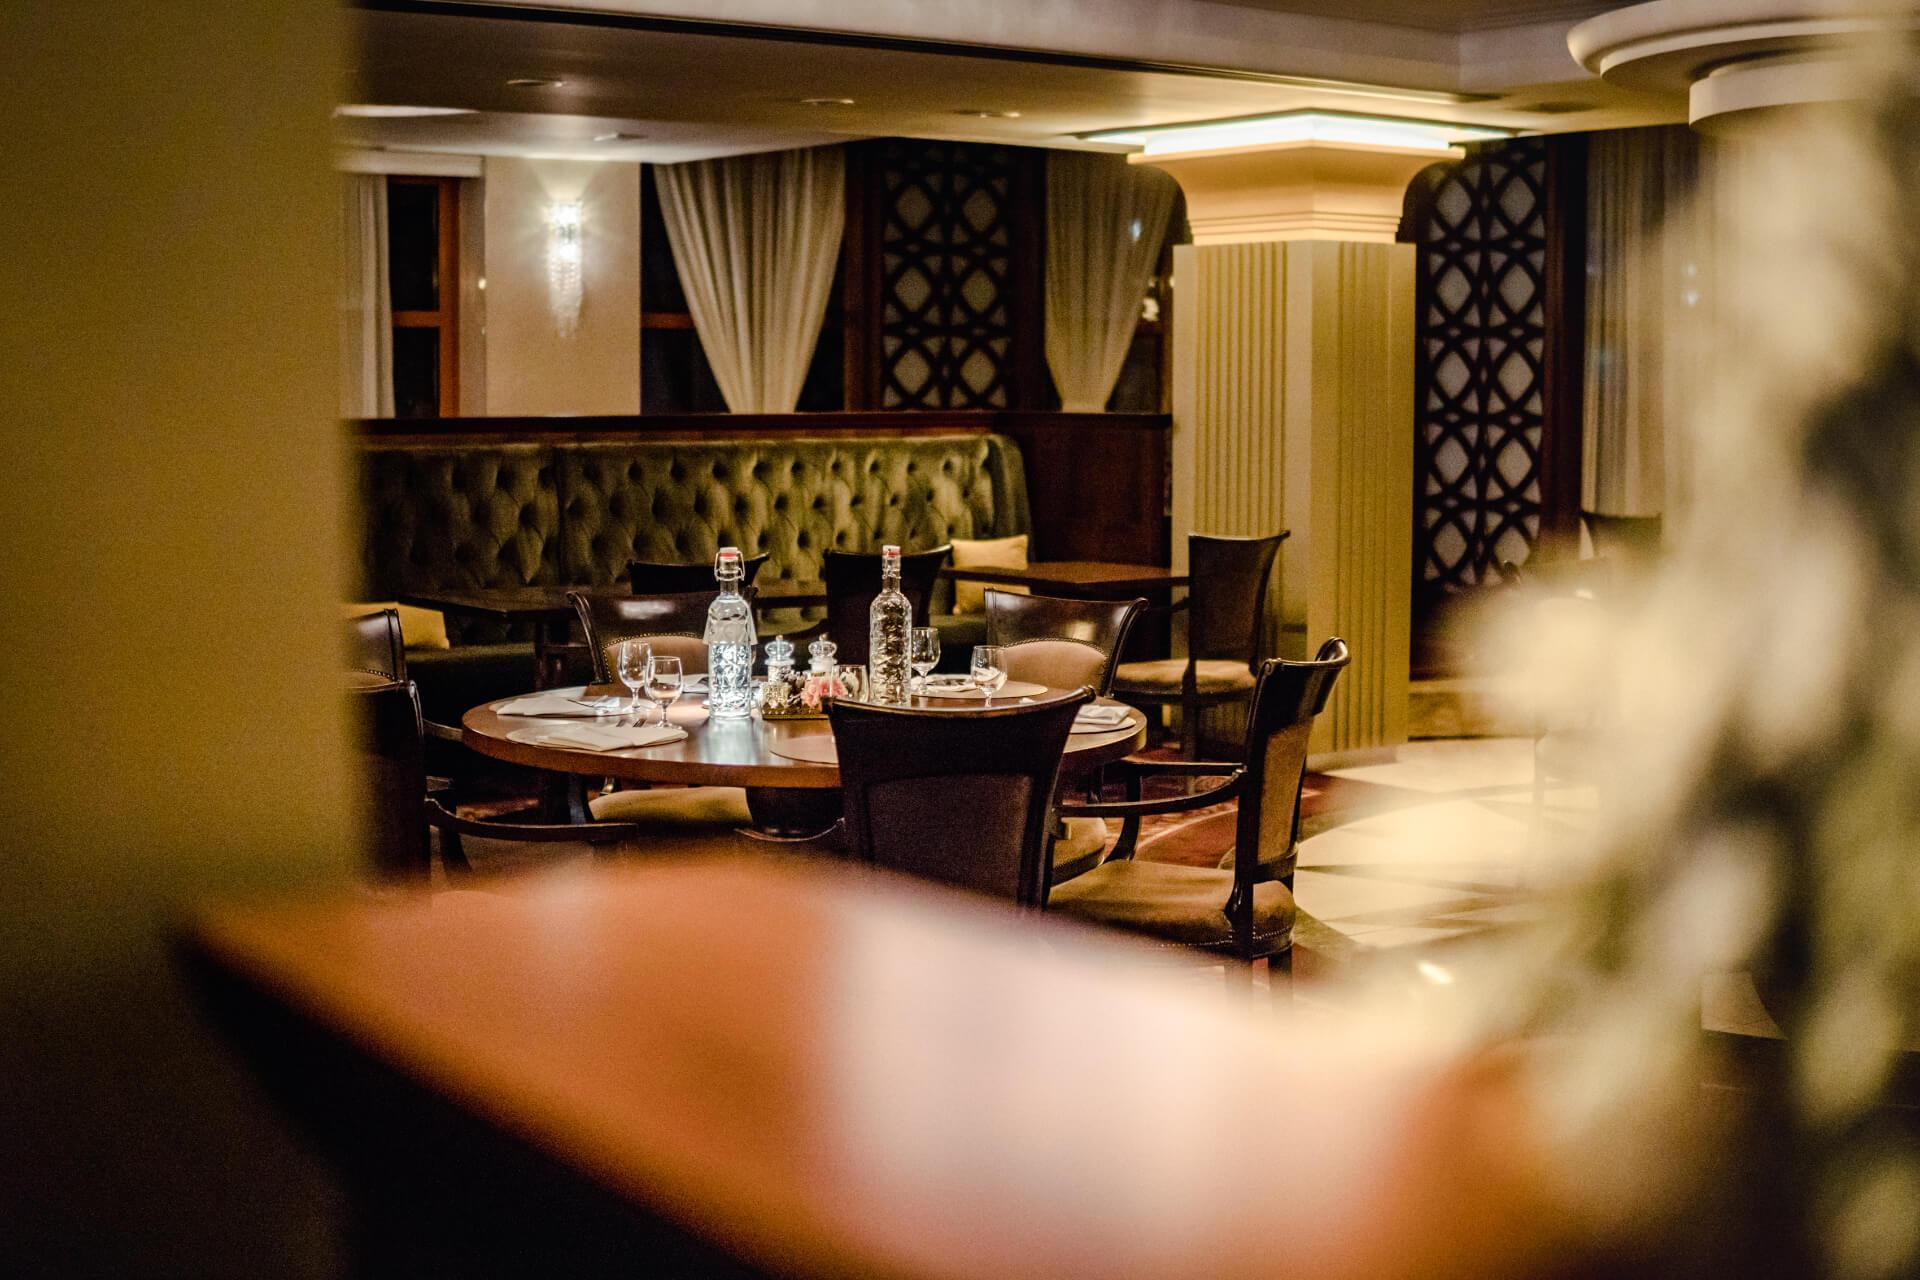 A stylish Lobby bar with a pleasant atmosphere is always a good choice.